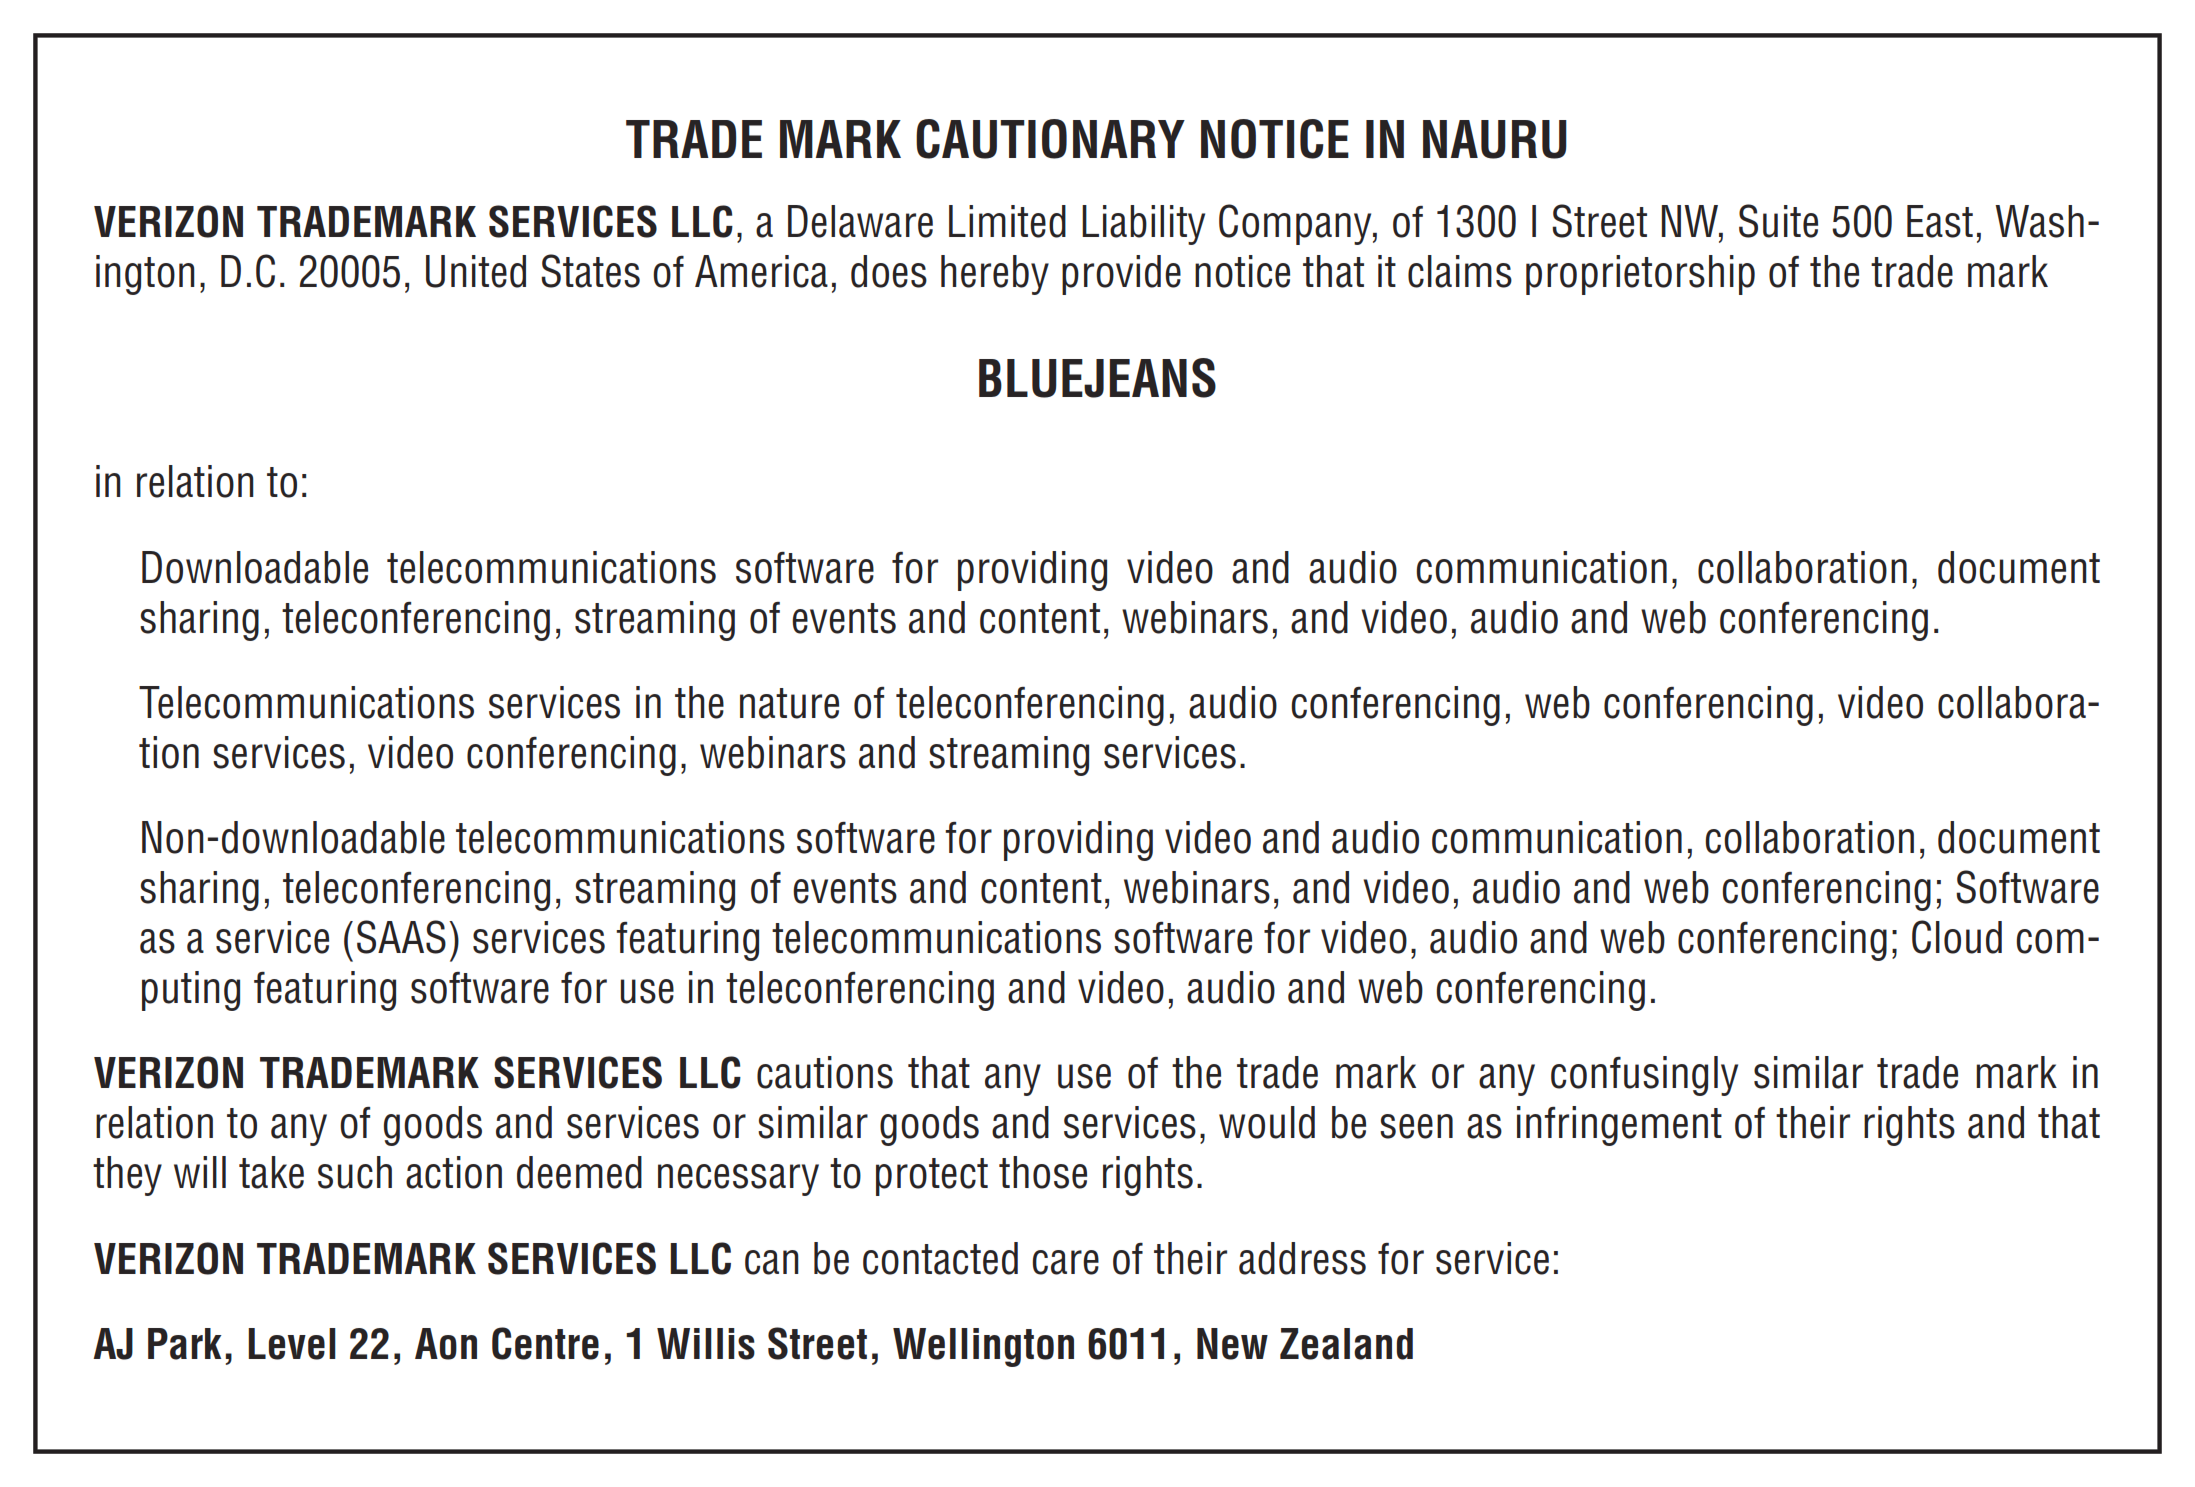 Cautionary notice BLUEJEANS in Nauru 001